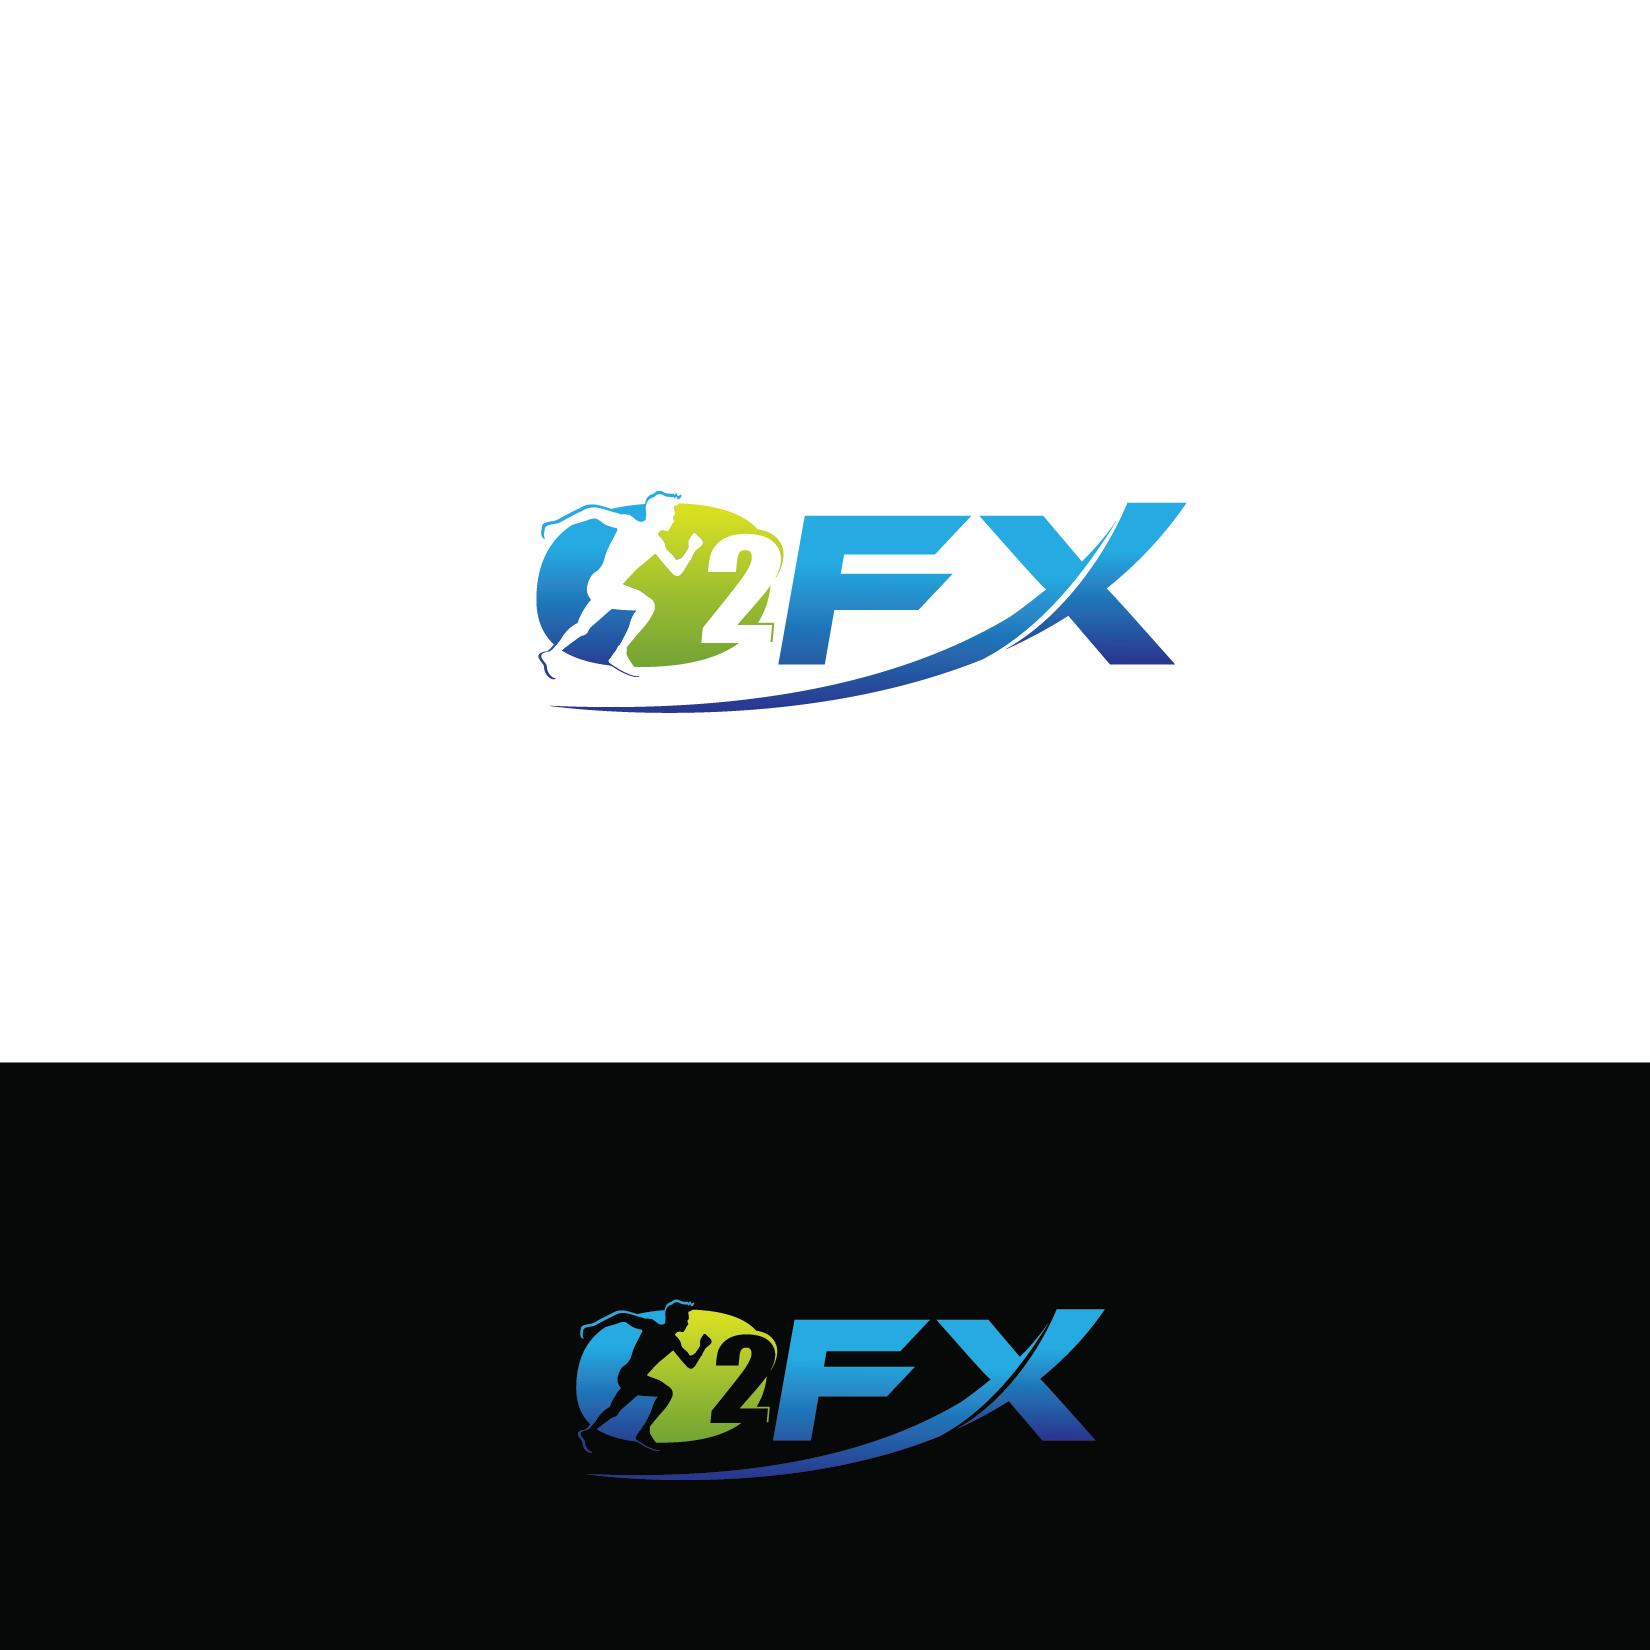 Logo Design by Private User - Entry No. 42 in the Logo Design Contest Captivating Logo Design for O2FX.